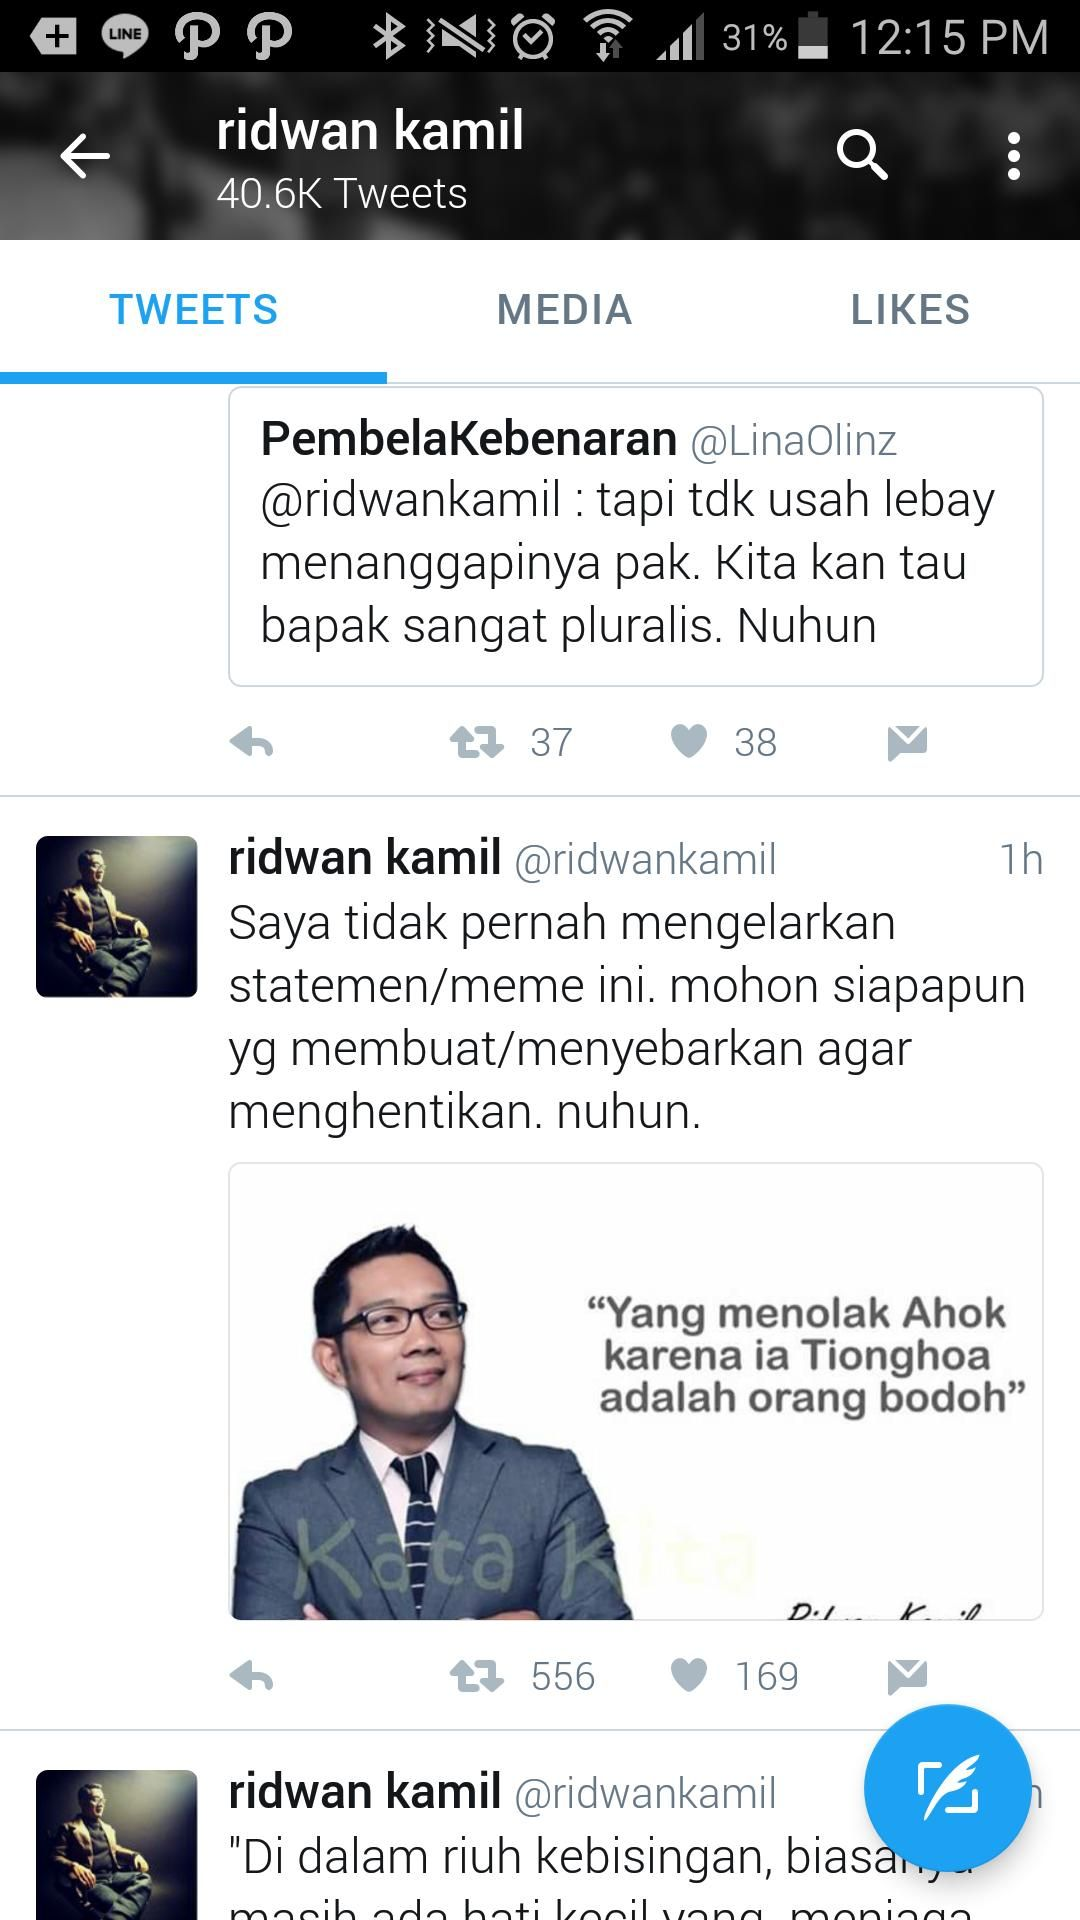 Foto: Meme yang diprotes Ridwan Kamil (Twitter/Istimewa)